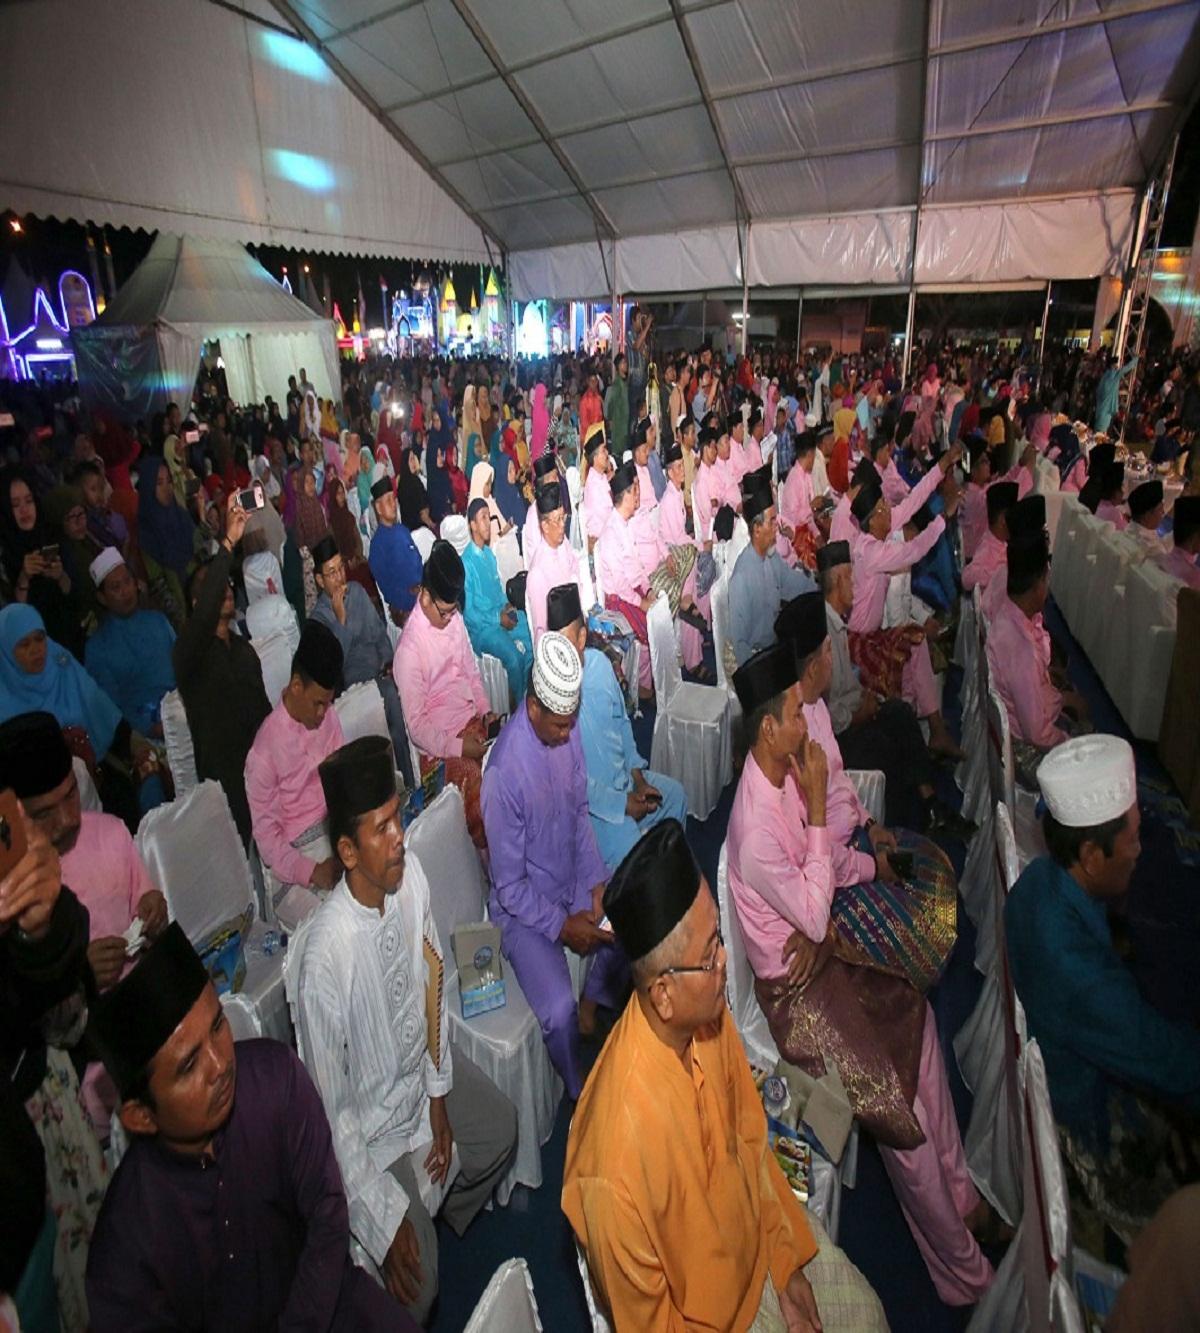 Masyarakat antusias menyaksikan Pembukaan MTQ ke- 29 Tingkat Kota Batam di Lapangan Bola Gladi Bakar Jaya Kelurahan Tanjung Riau Sekupang.